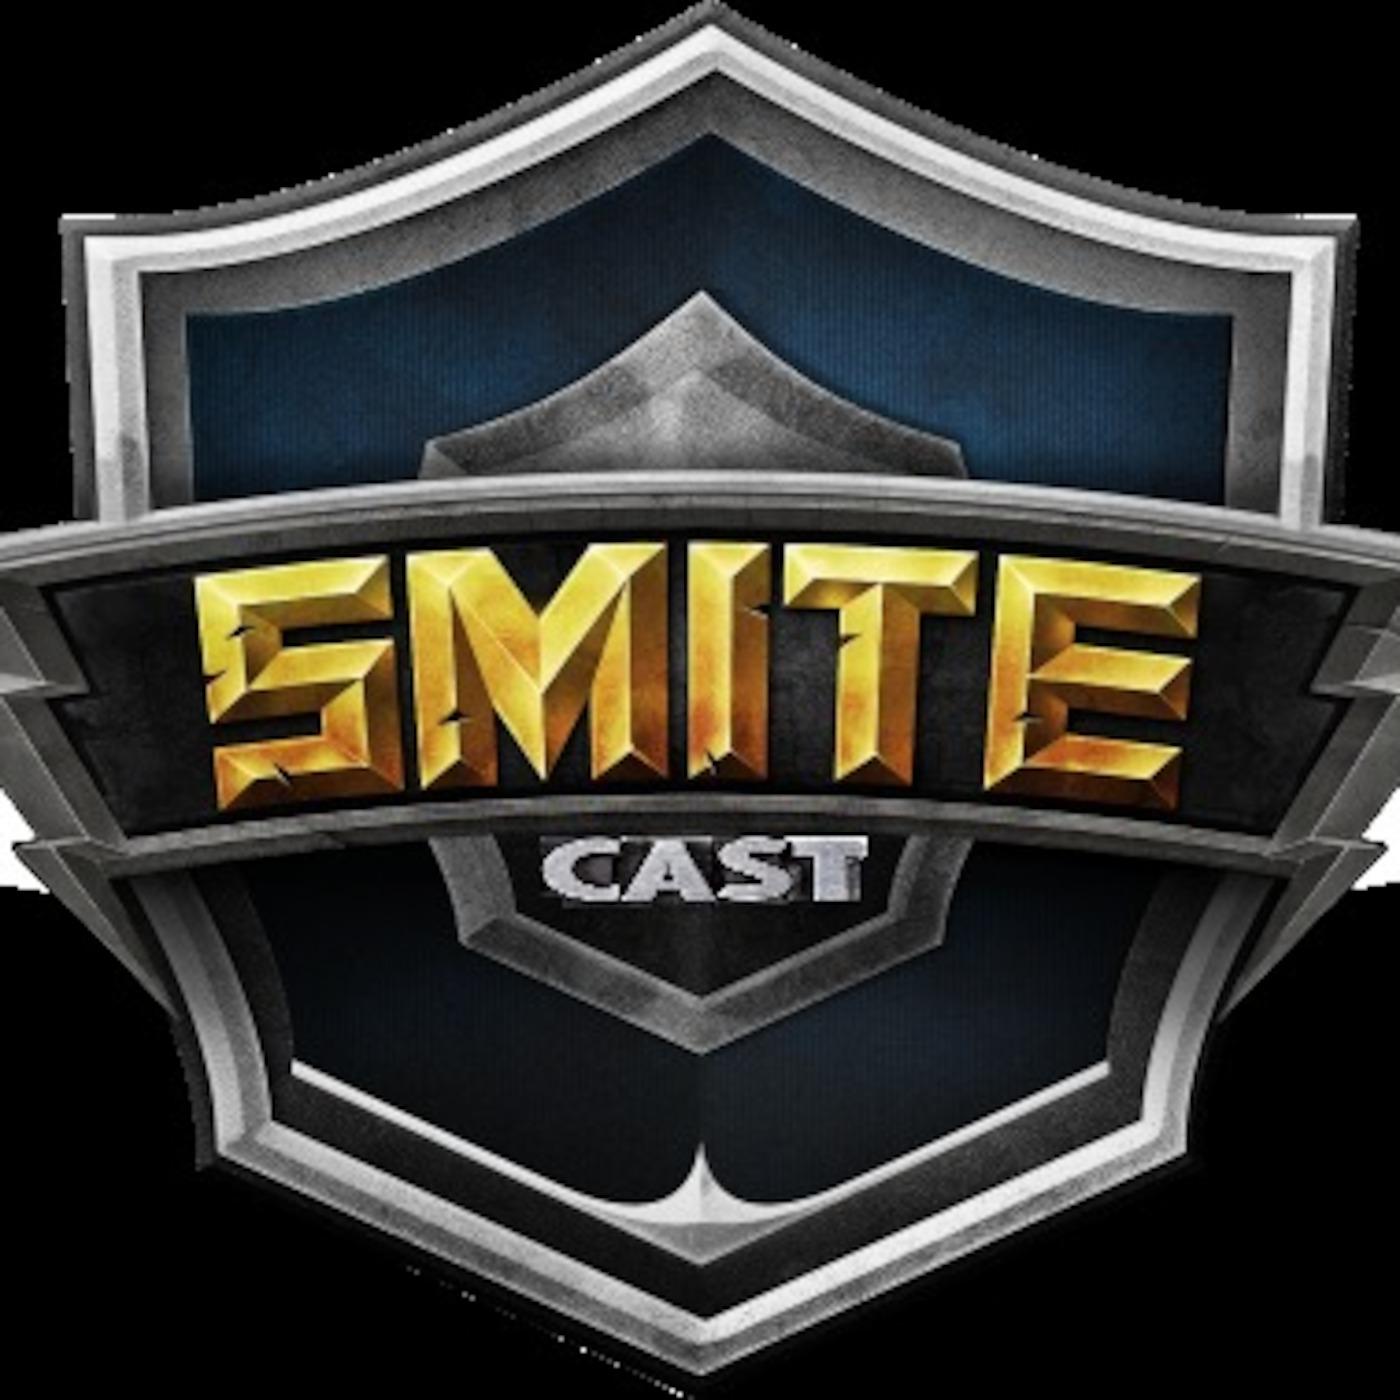 SmiteCast